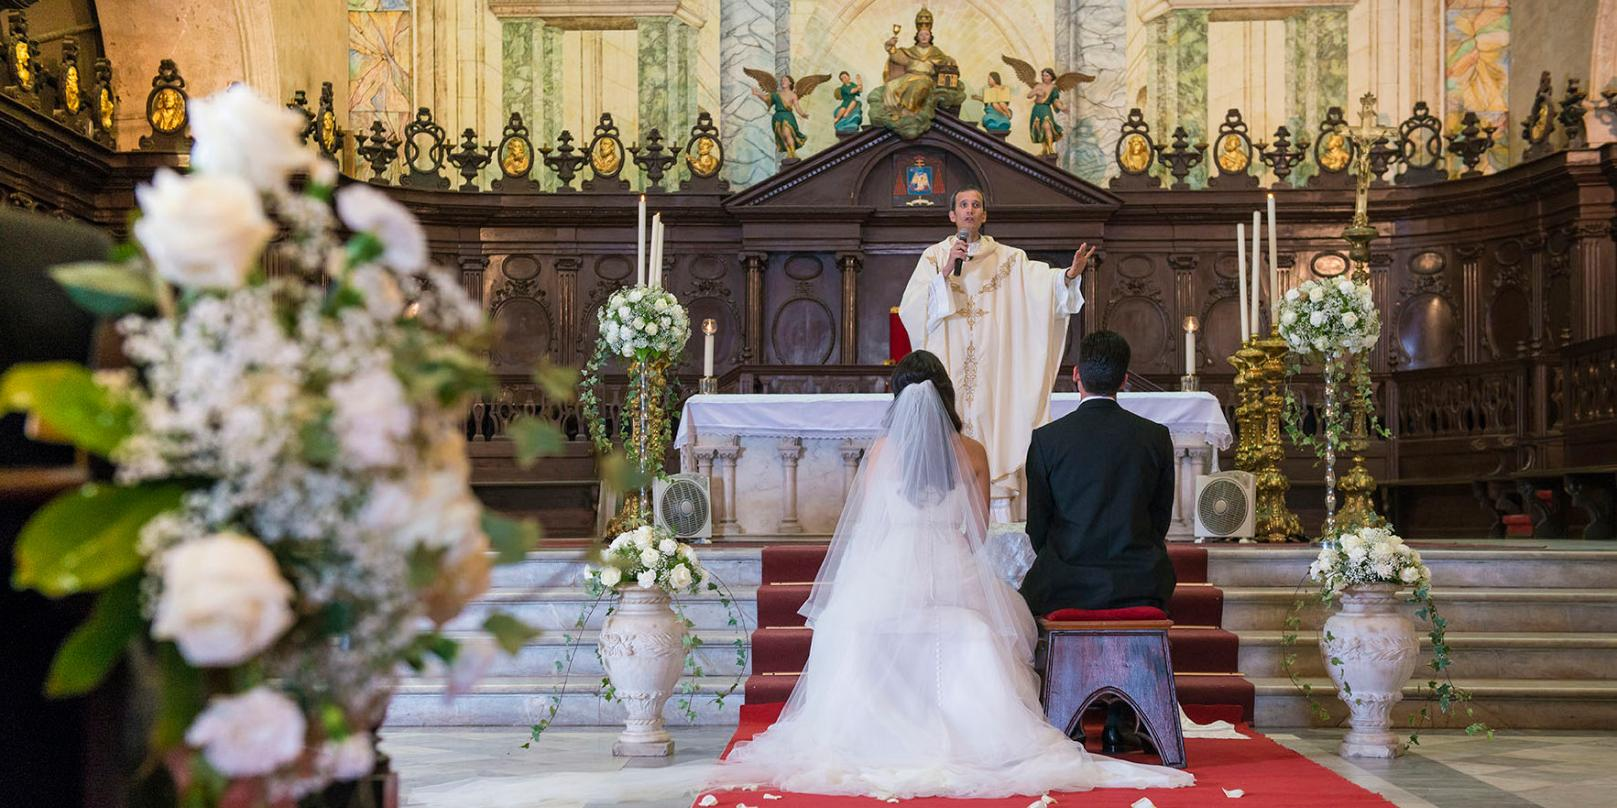 bodas-sin-clasificar-sin-tema-cuba-14881.jpg